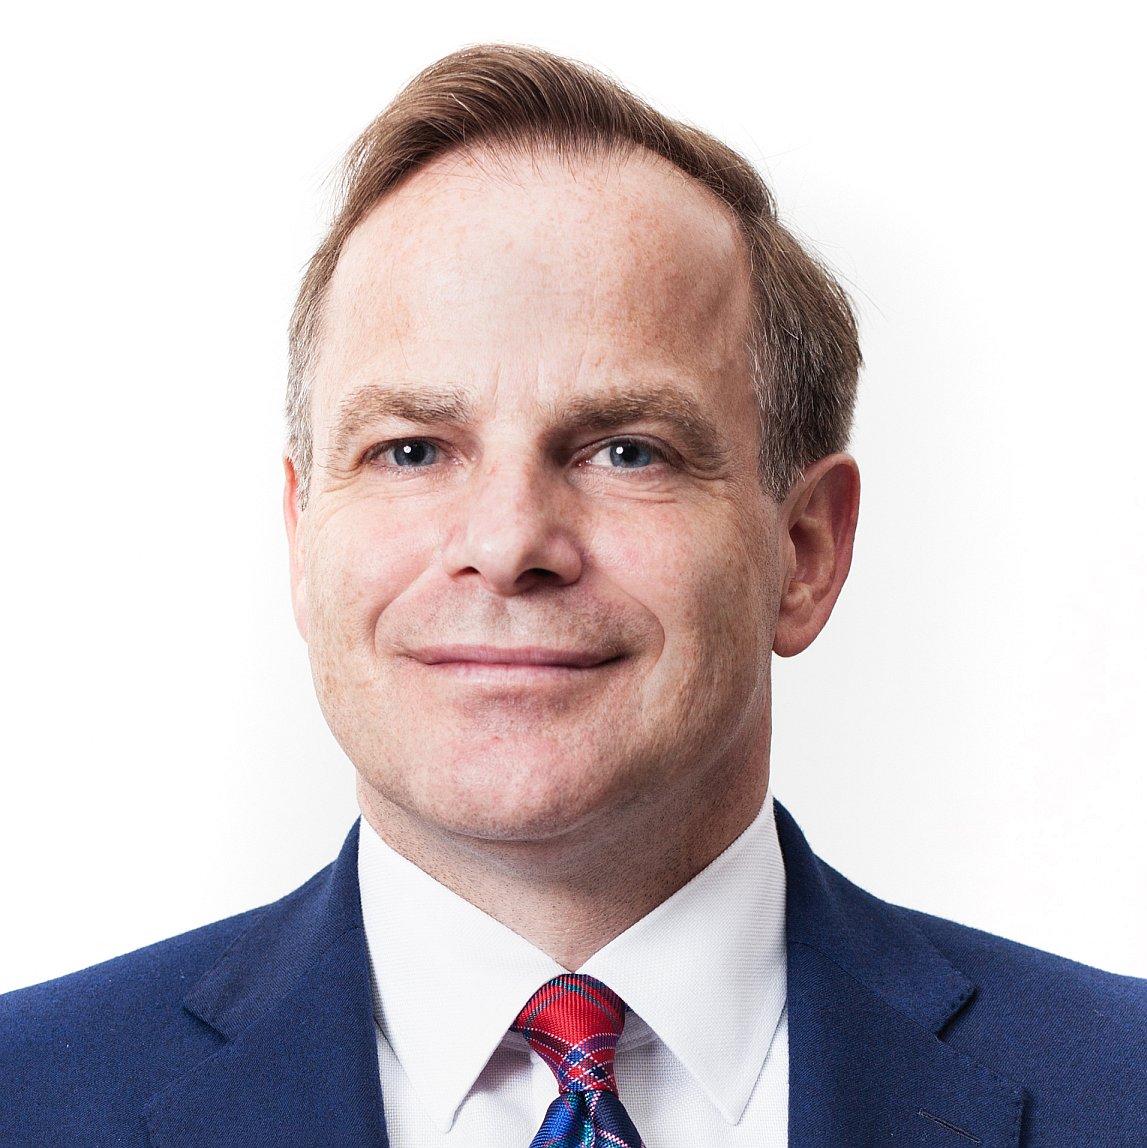 Daniel Klíma, CEO of CGL in Prague